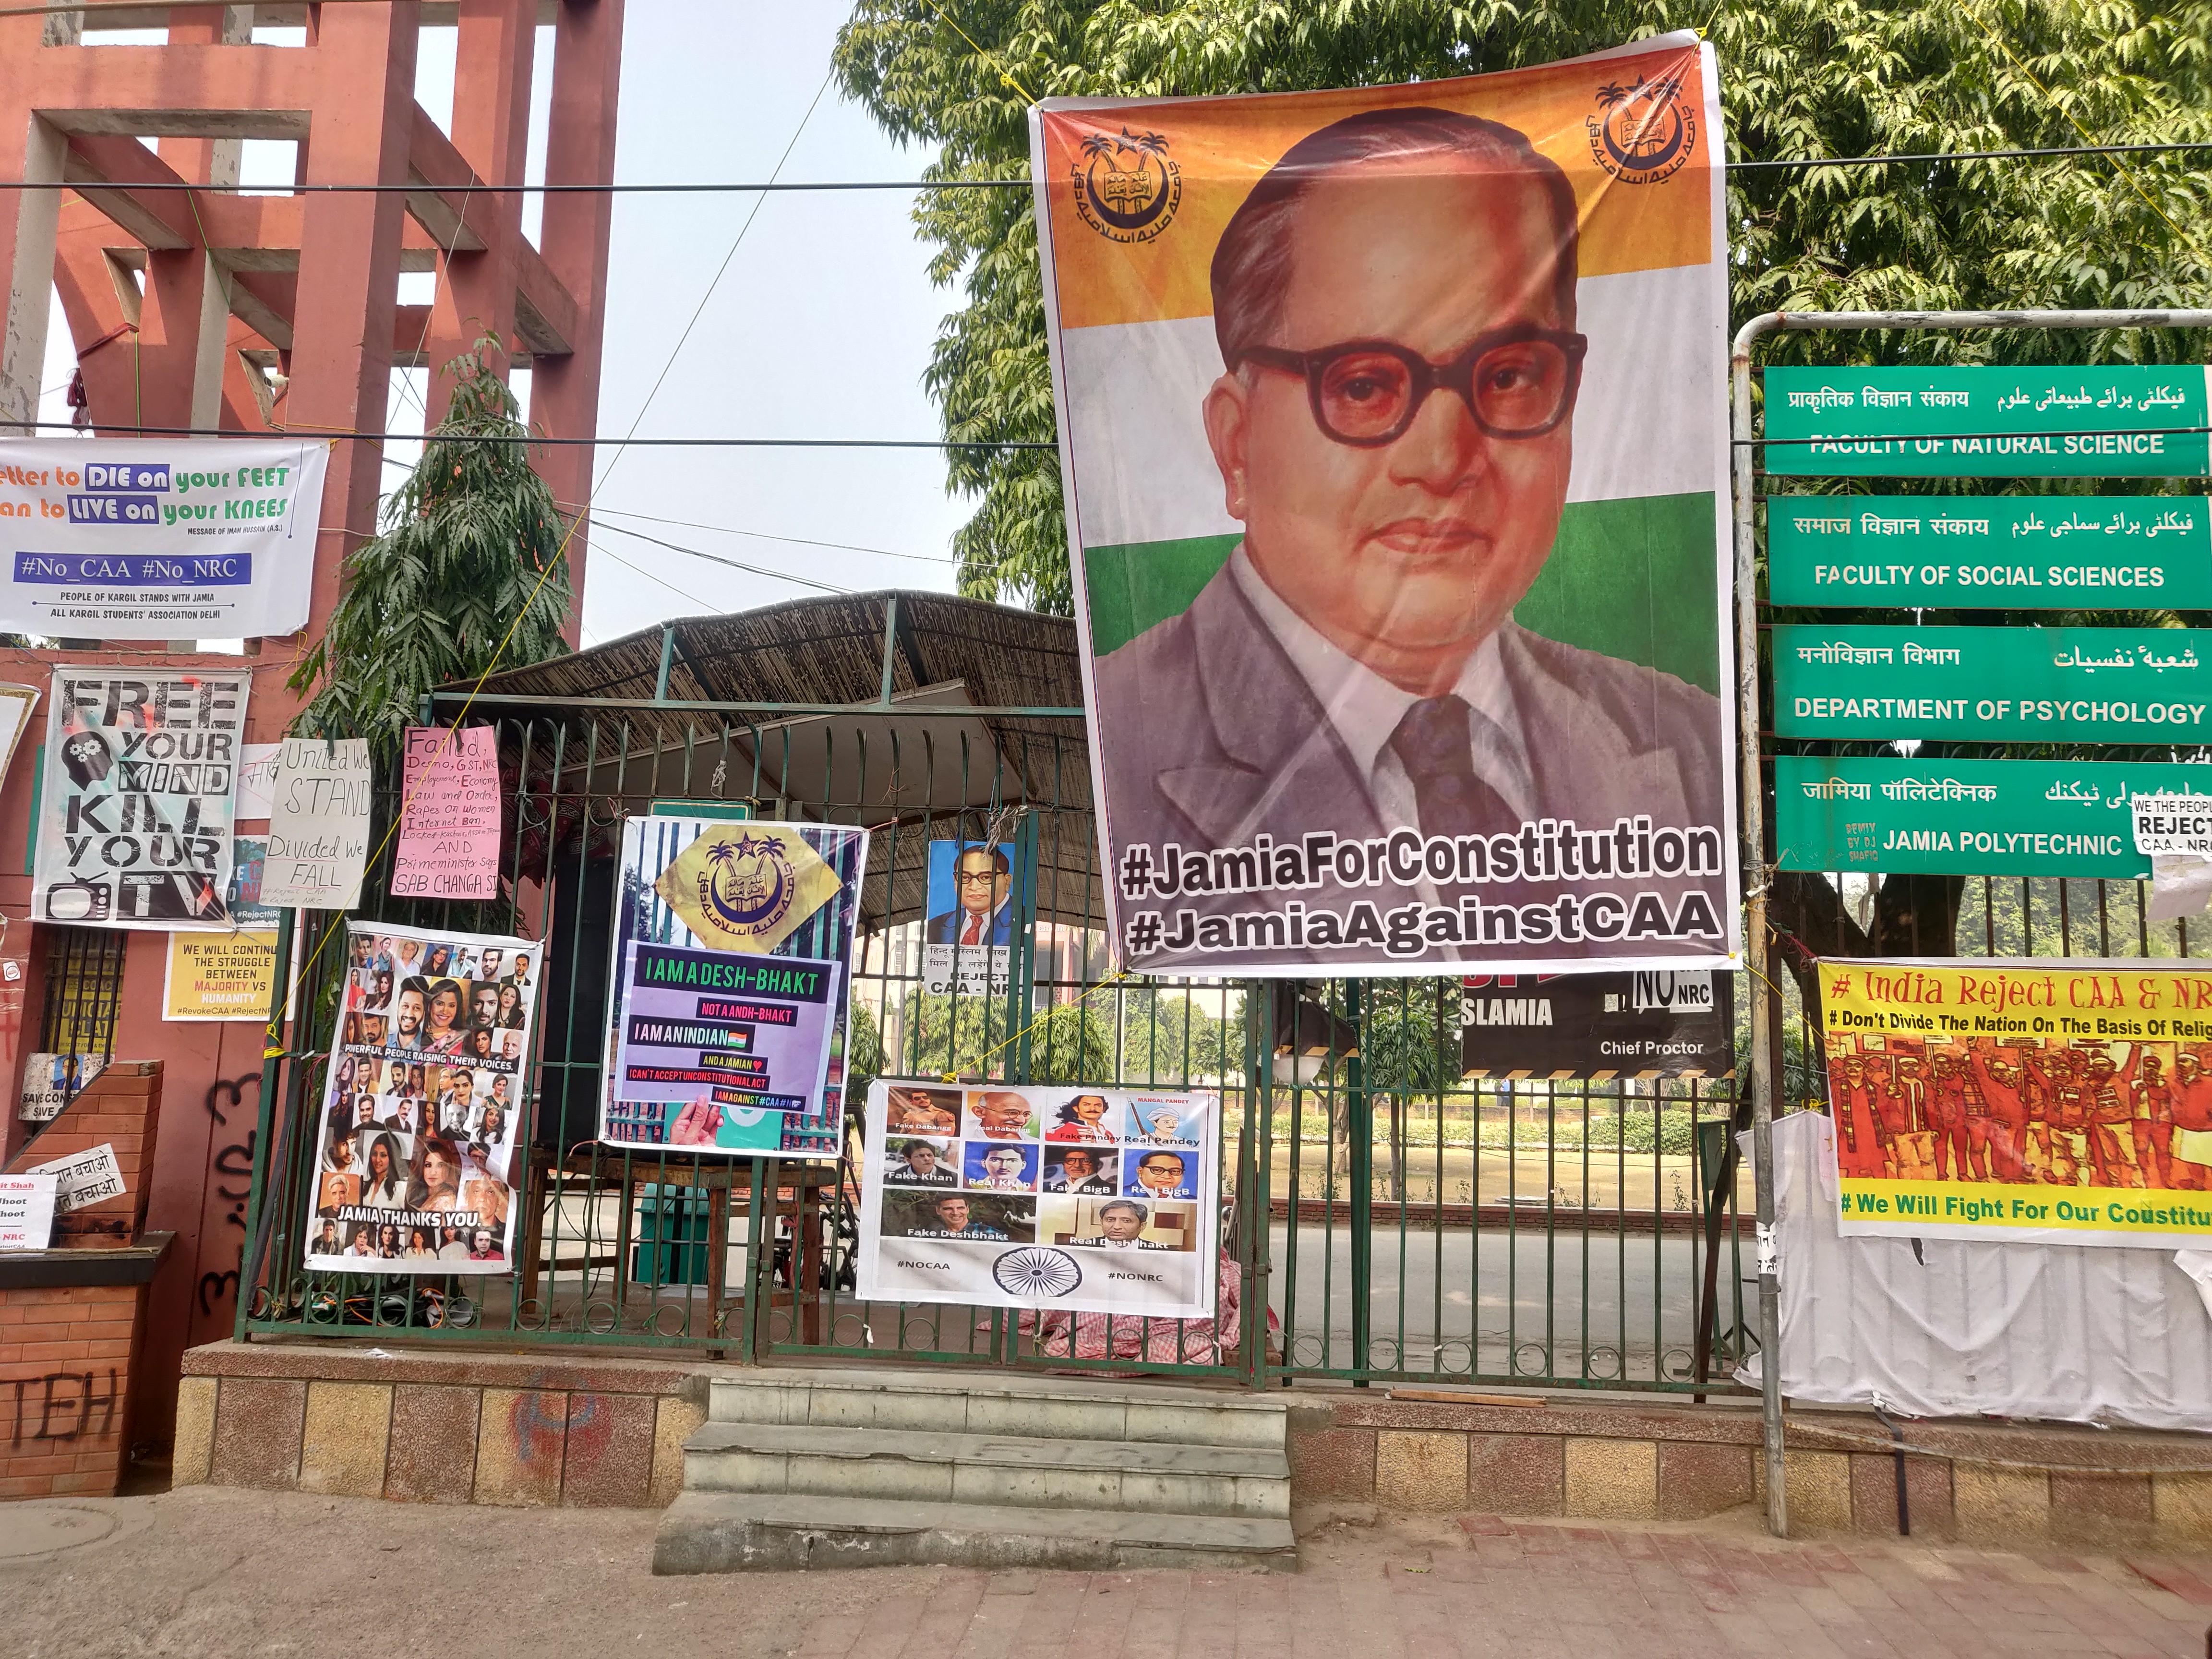 Posters at the anti-CAA rallying point in Jamia Millia Islamia, Delhi, India, 2020 | J-T.M.